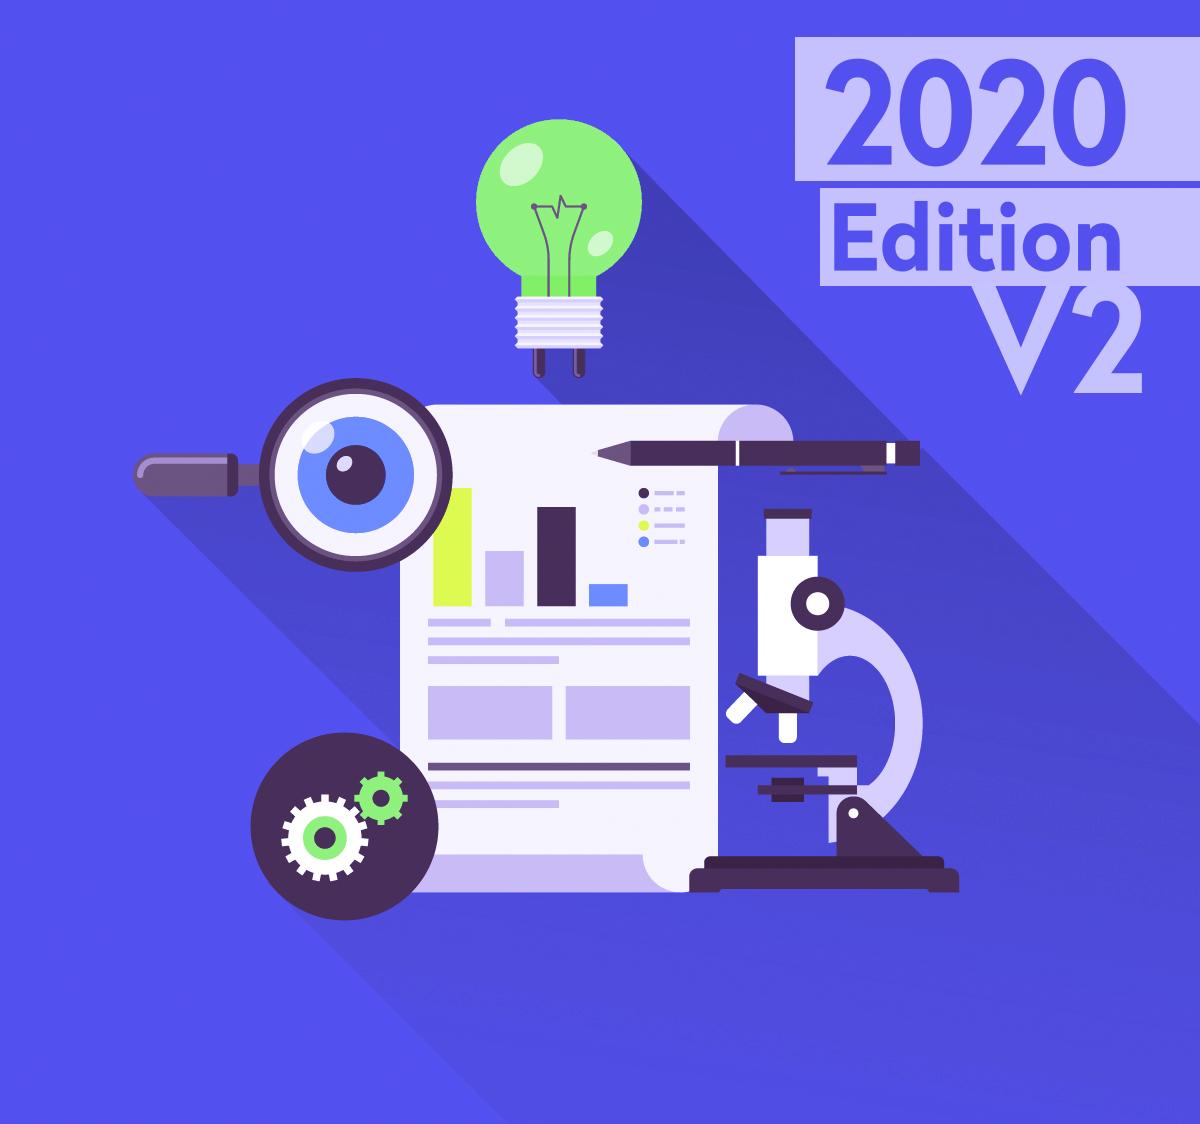 Paper-writing December 2020